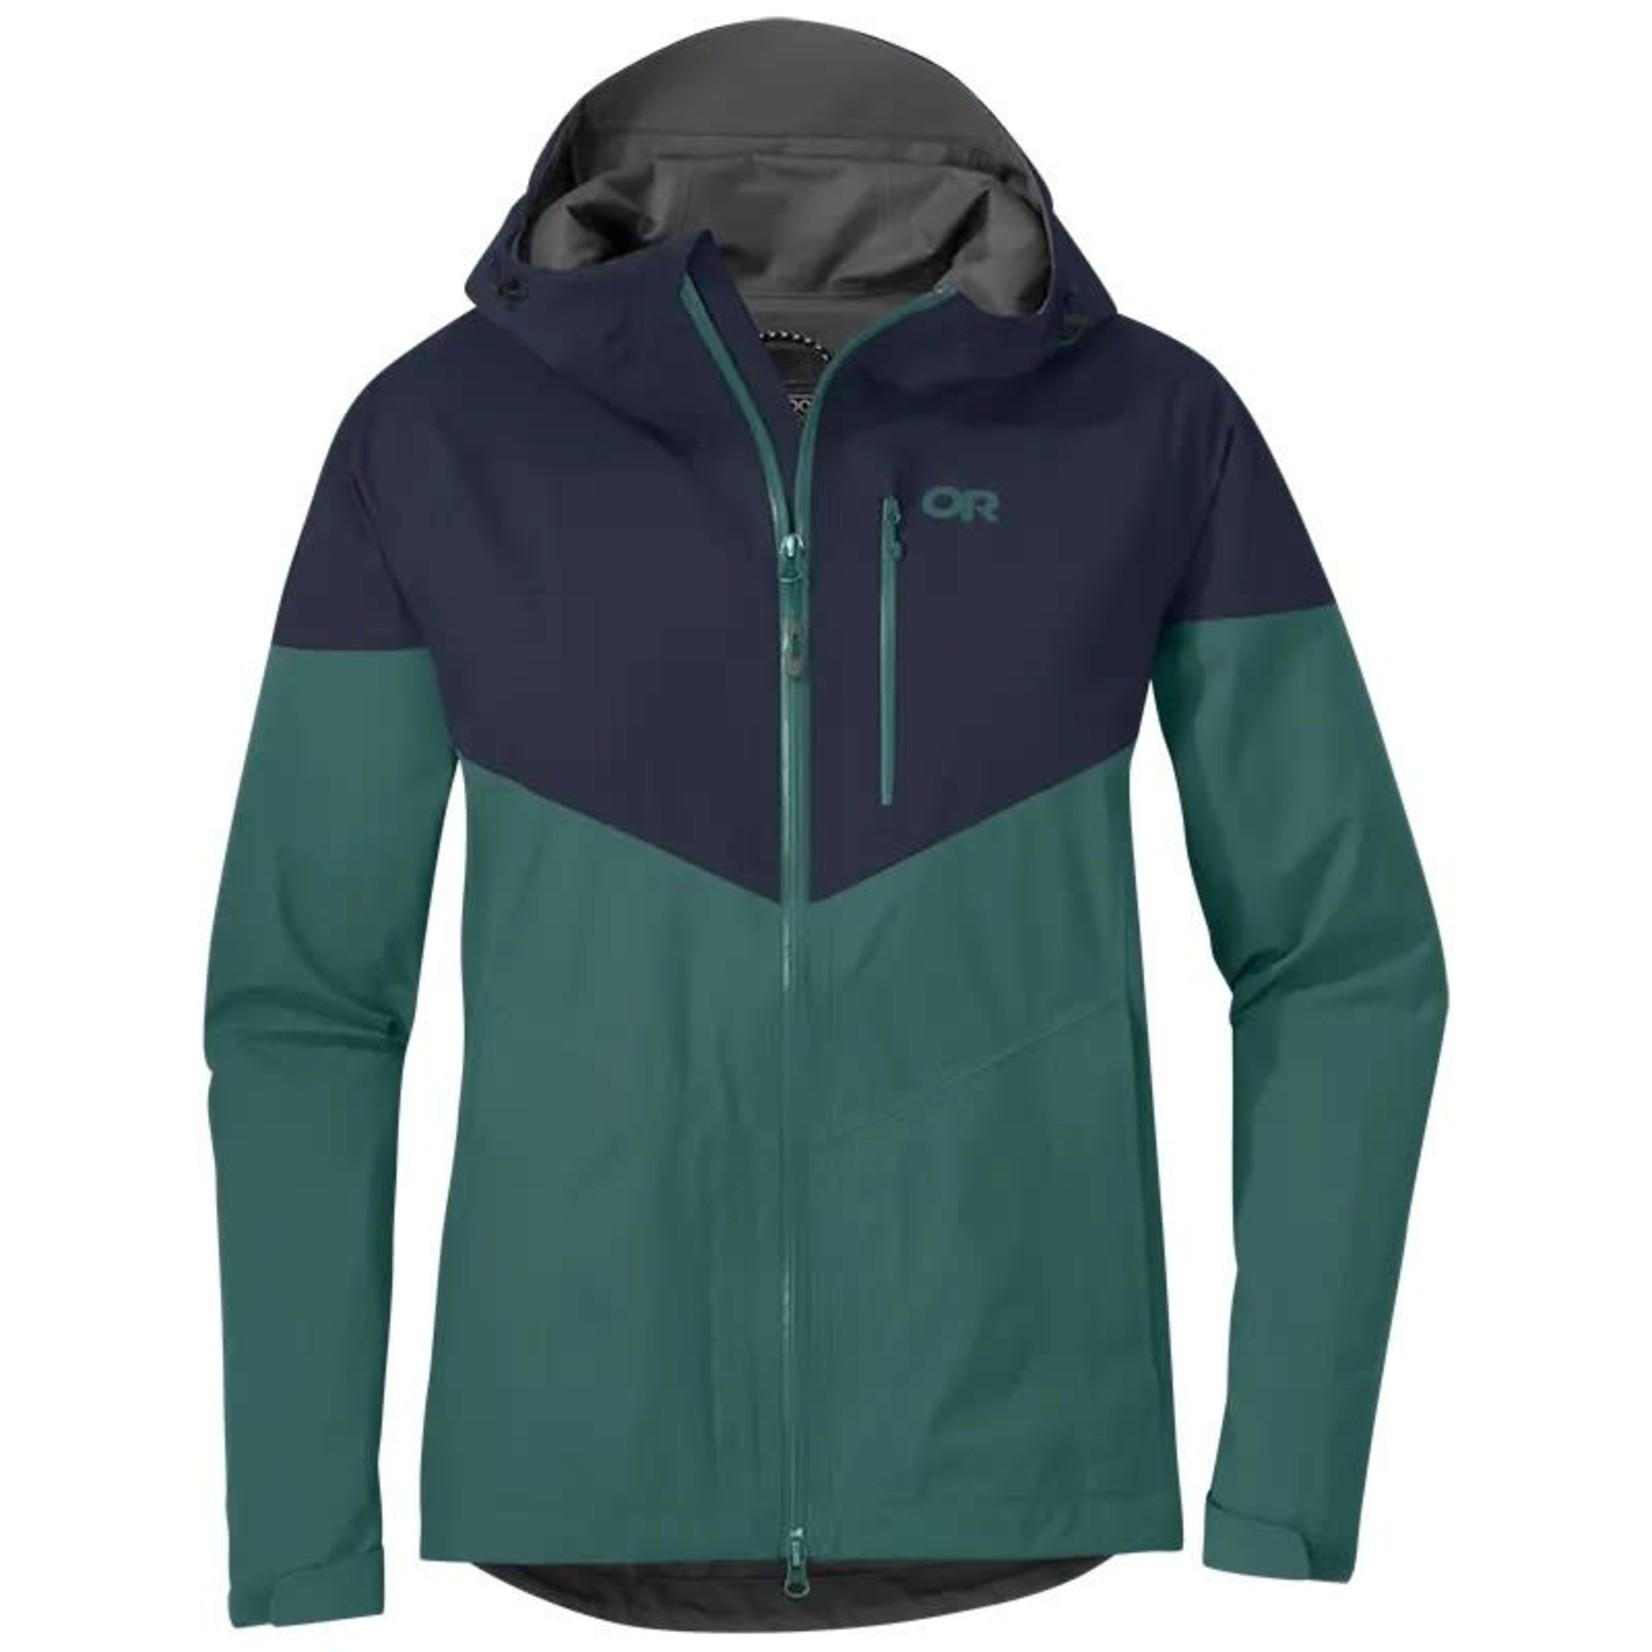 Outdoor Research Outdoor Research Aspire Jacket - Women